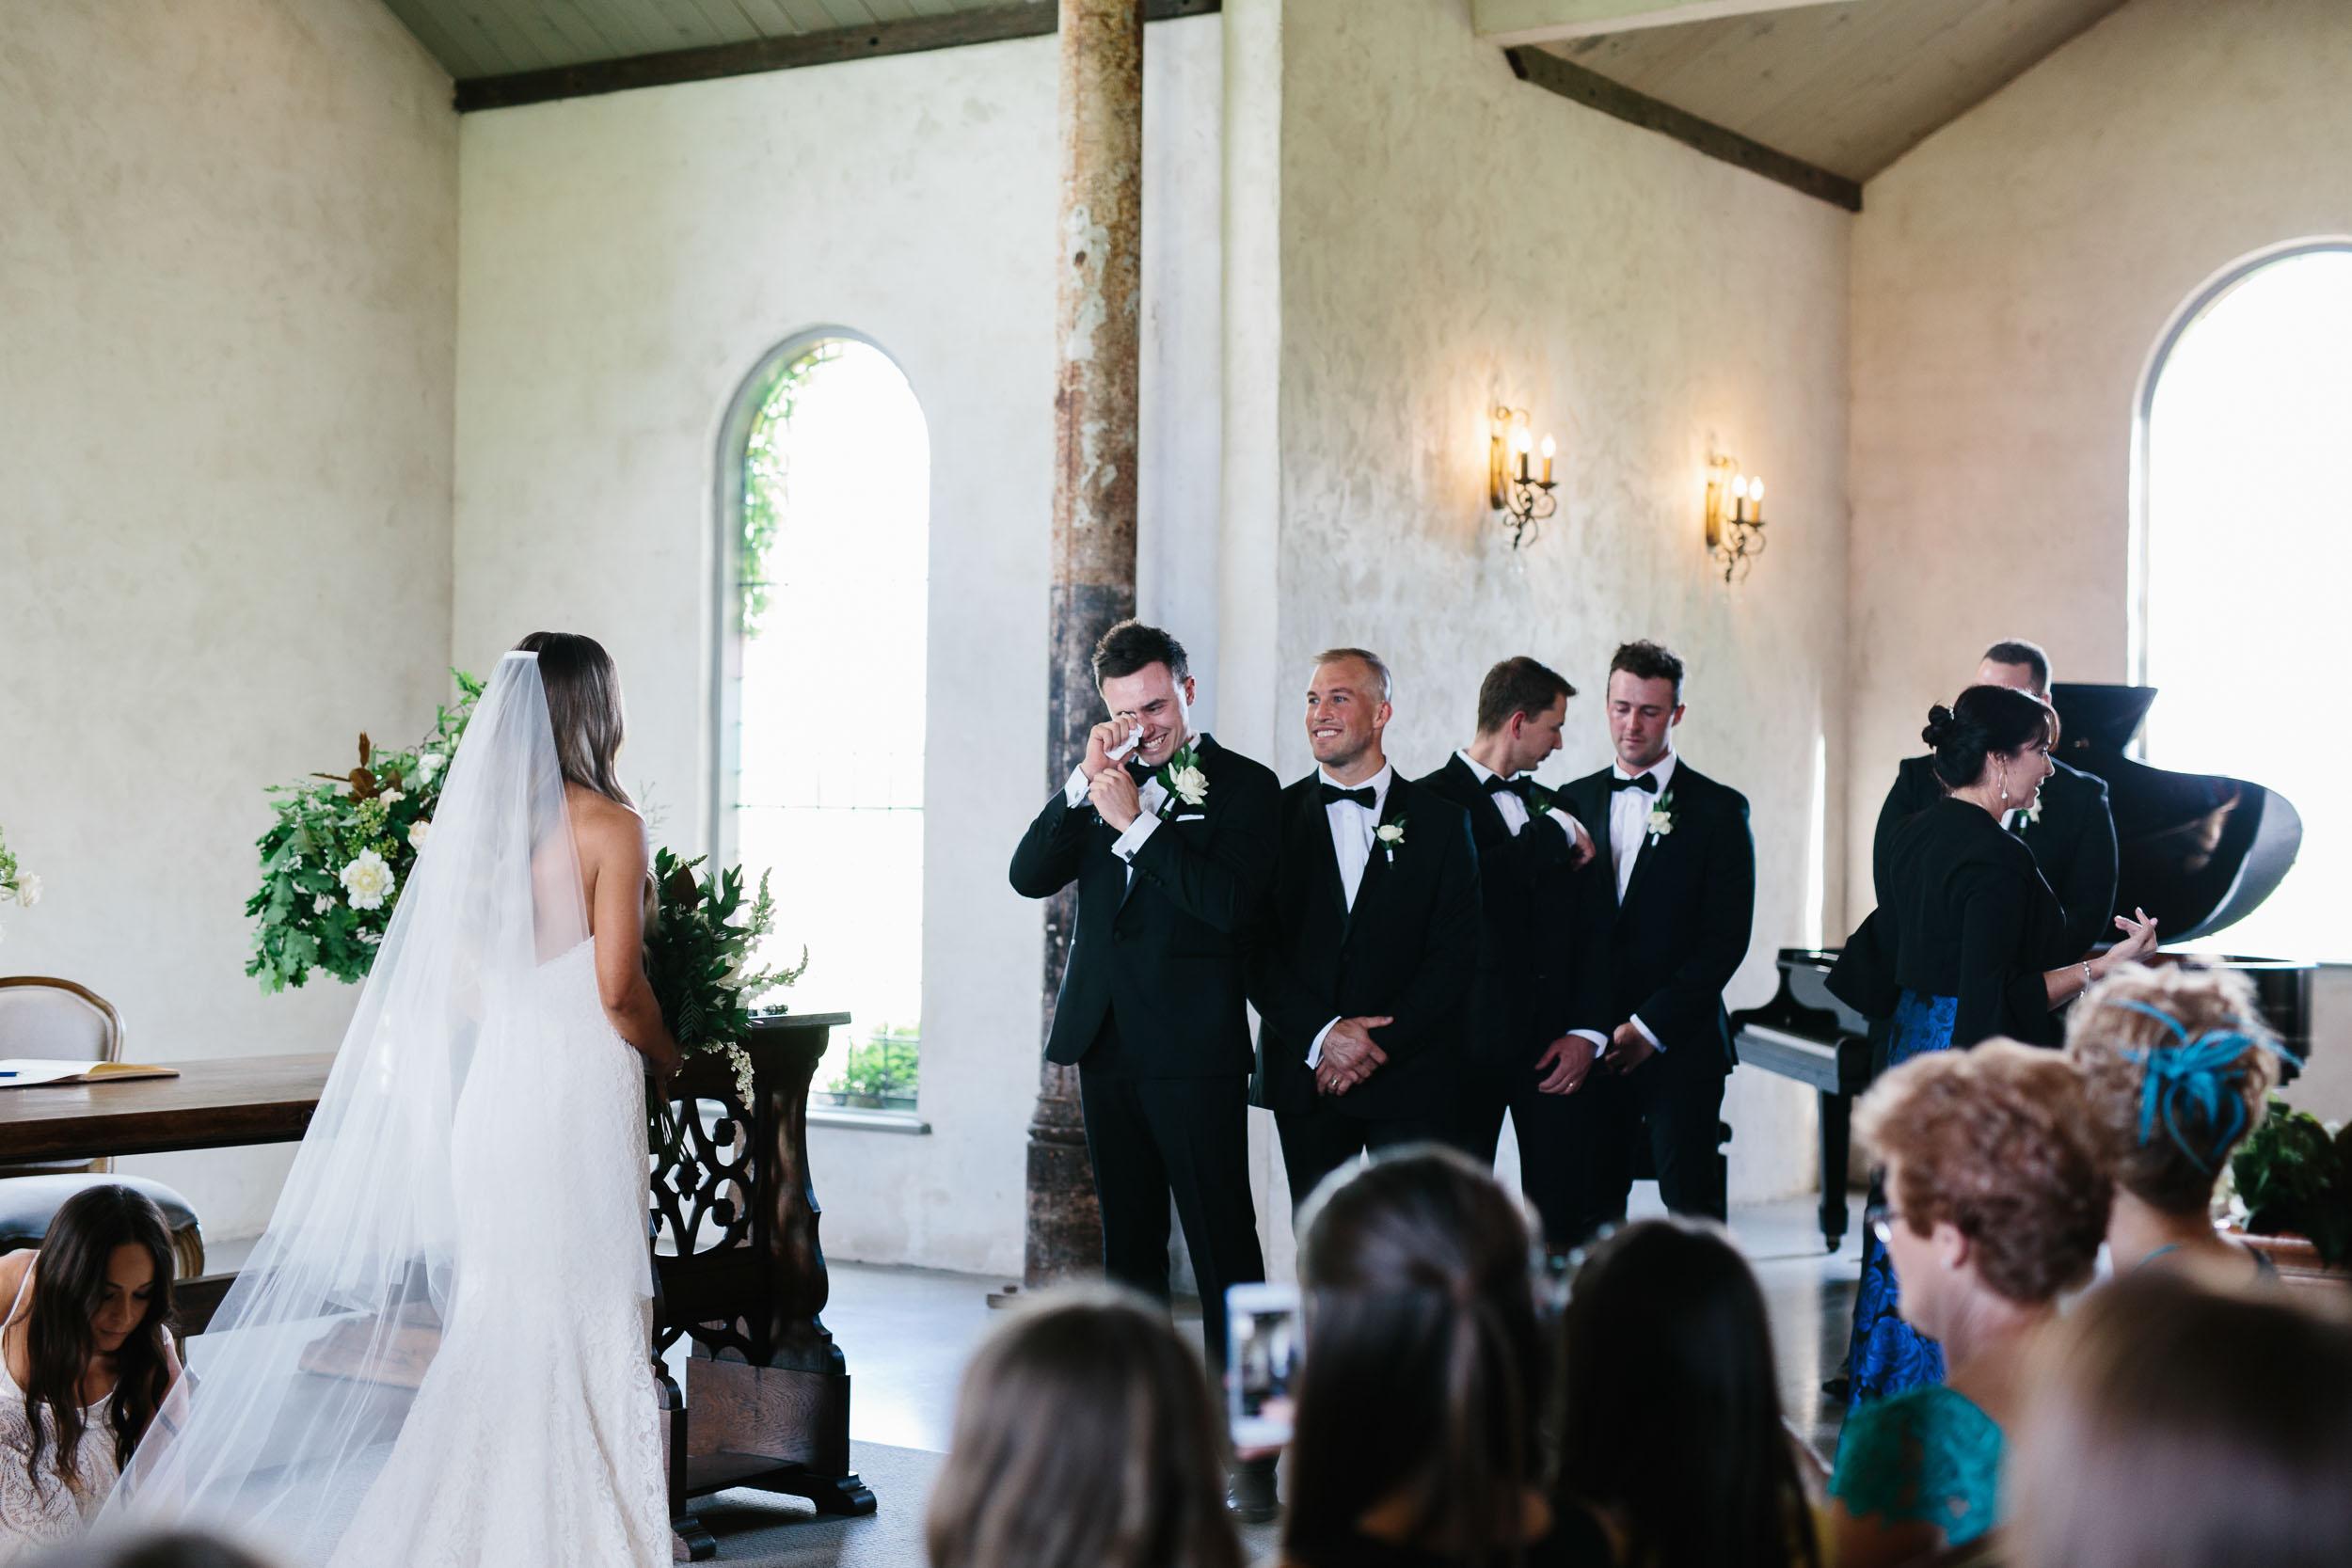 Kas-Richards-Stones-of-the-Yarra-Valley-Wedding-325.jpg